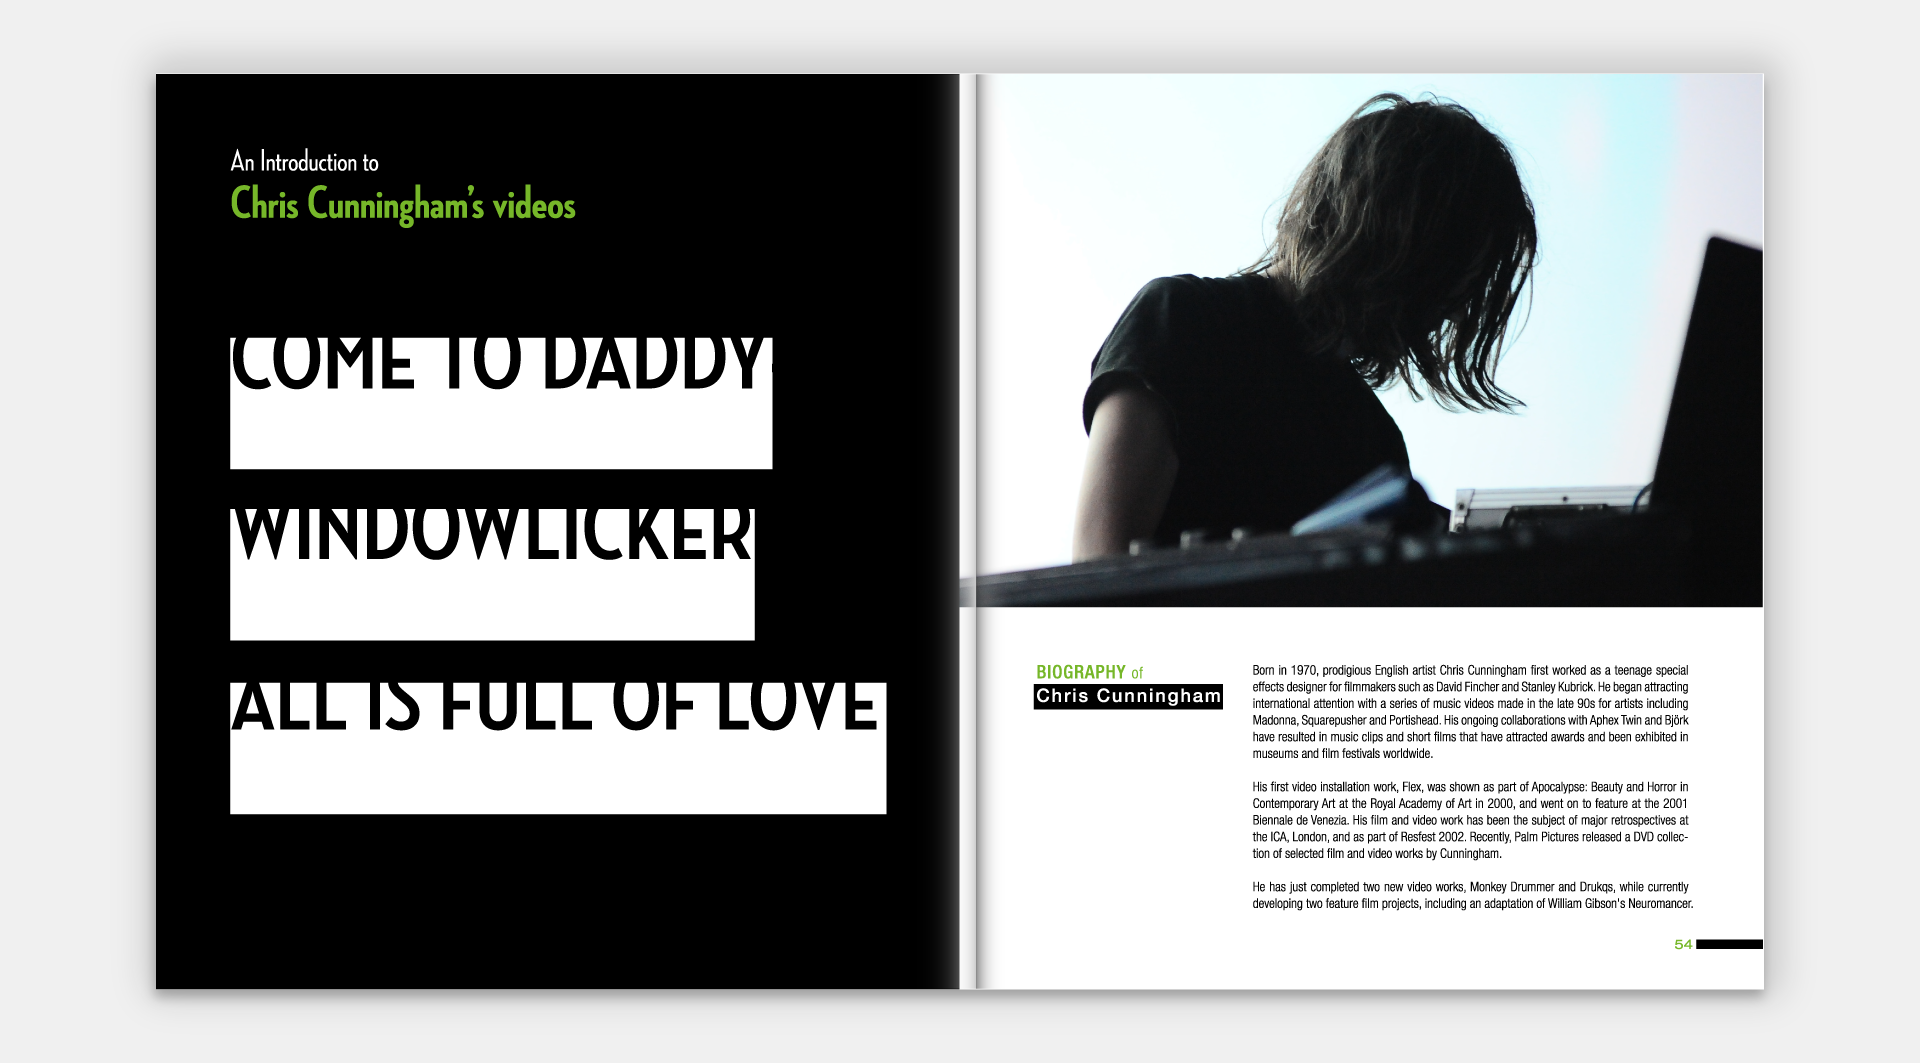 Seite 51-52